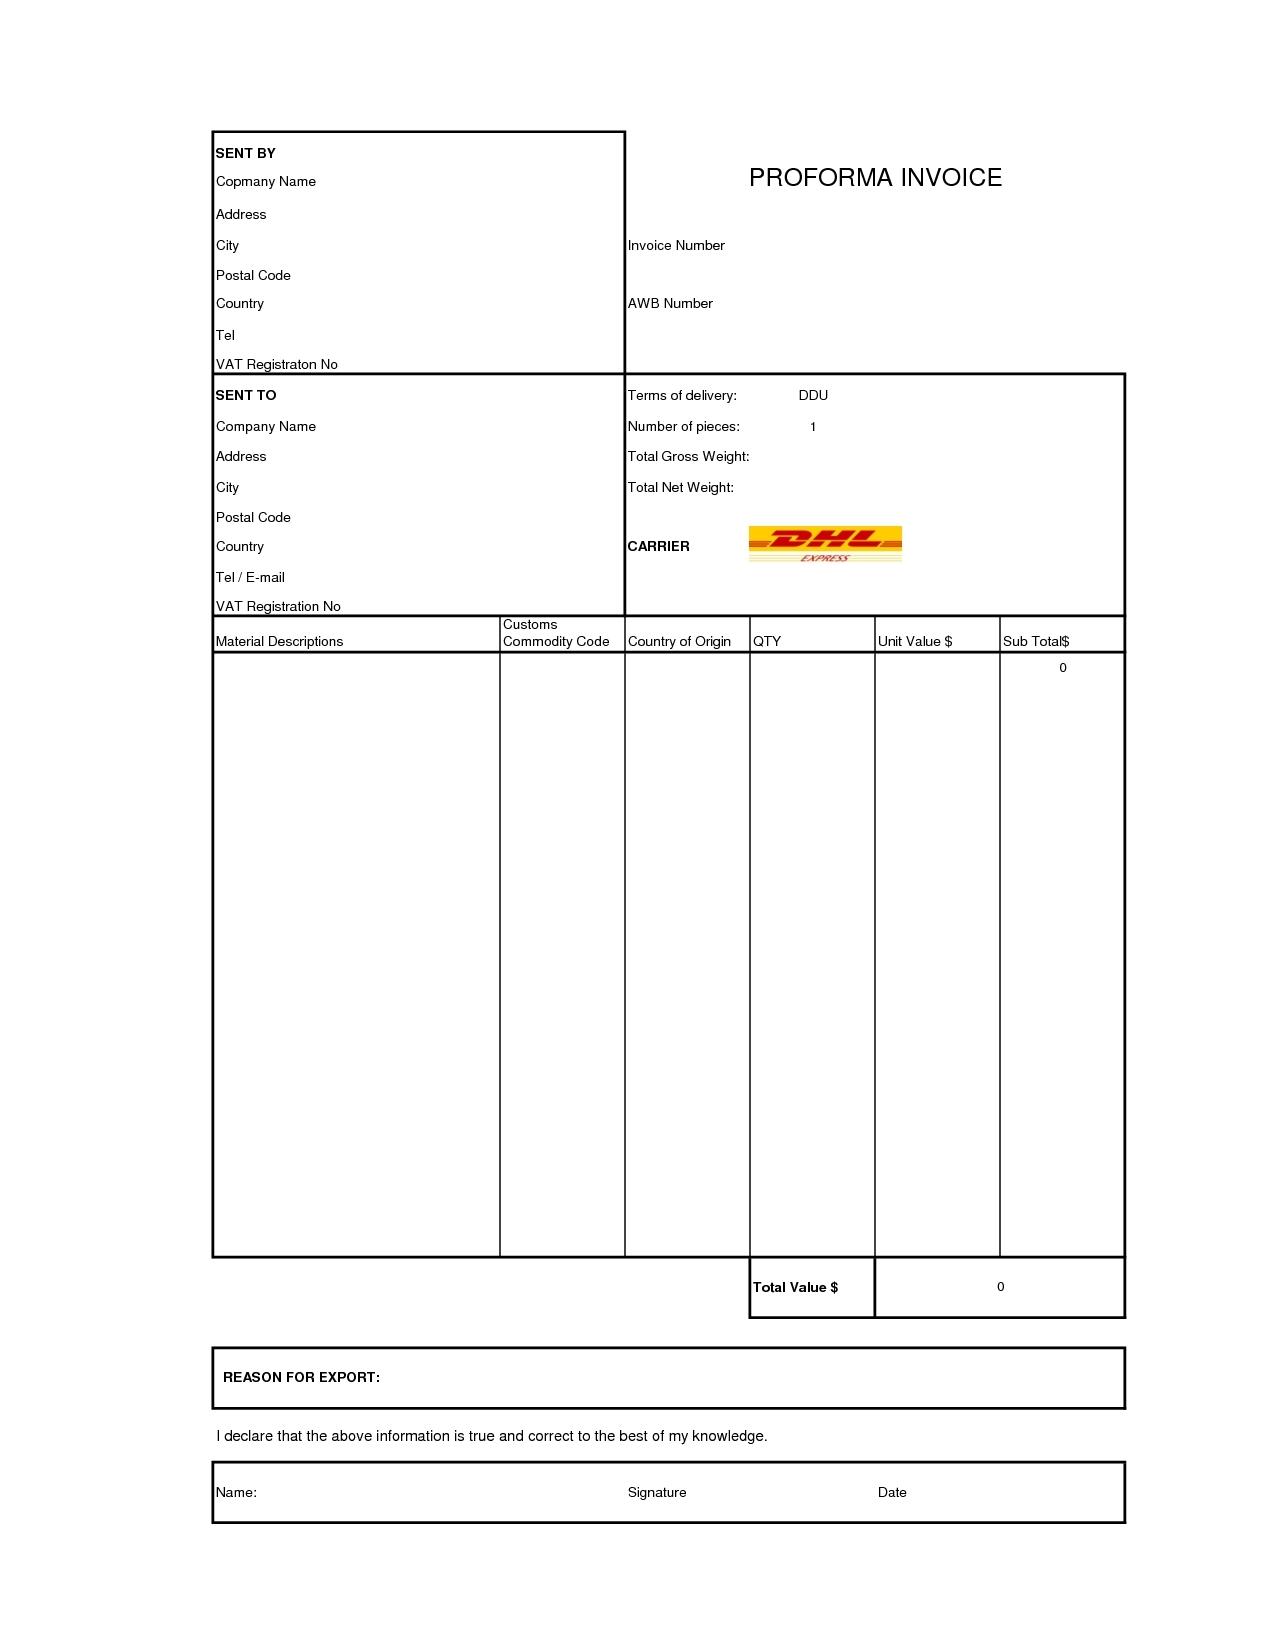 Dhl Invoice Template | Design Invoice Template